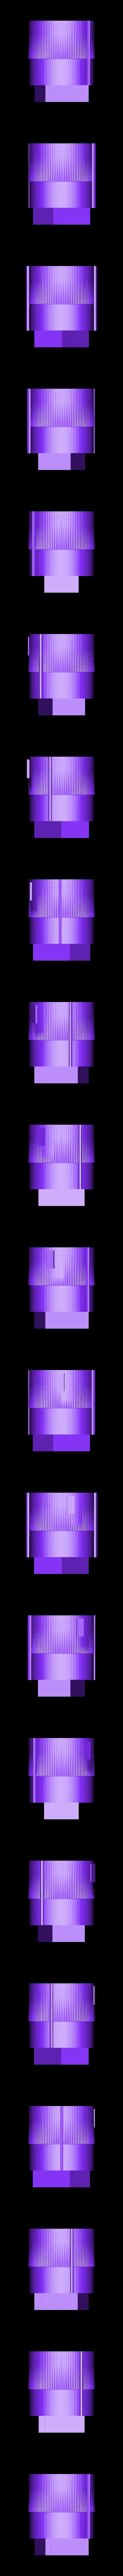 S-I top part b.stl Download free STL file Saturn V Rocket - Stage 1 • 3D printable template, spac3D